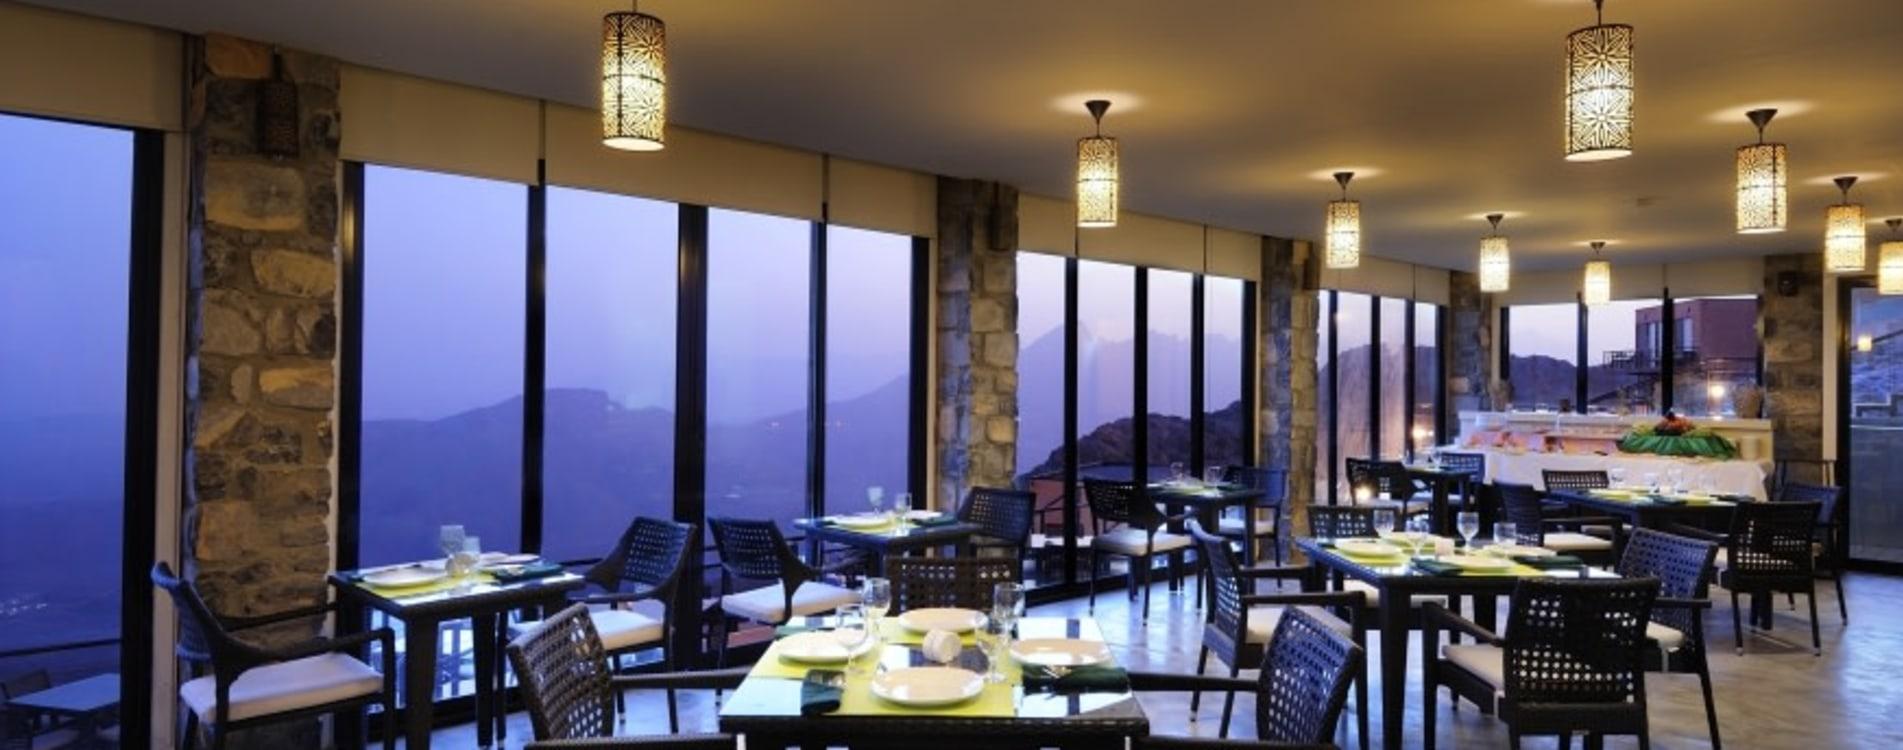 The-View-Oman-Restaurant-Interior.jpg